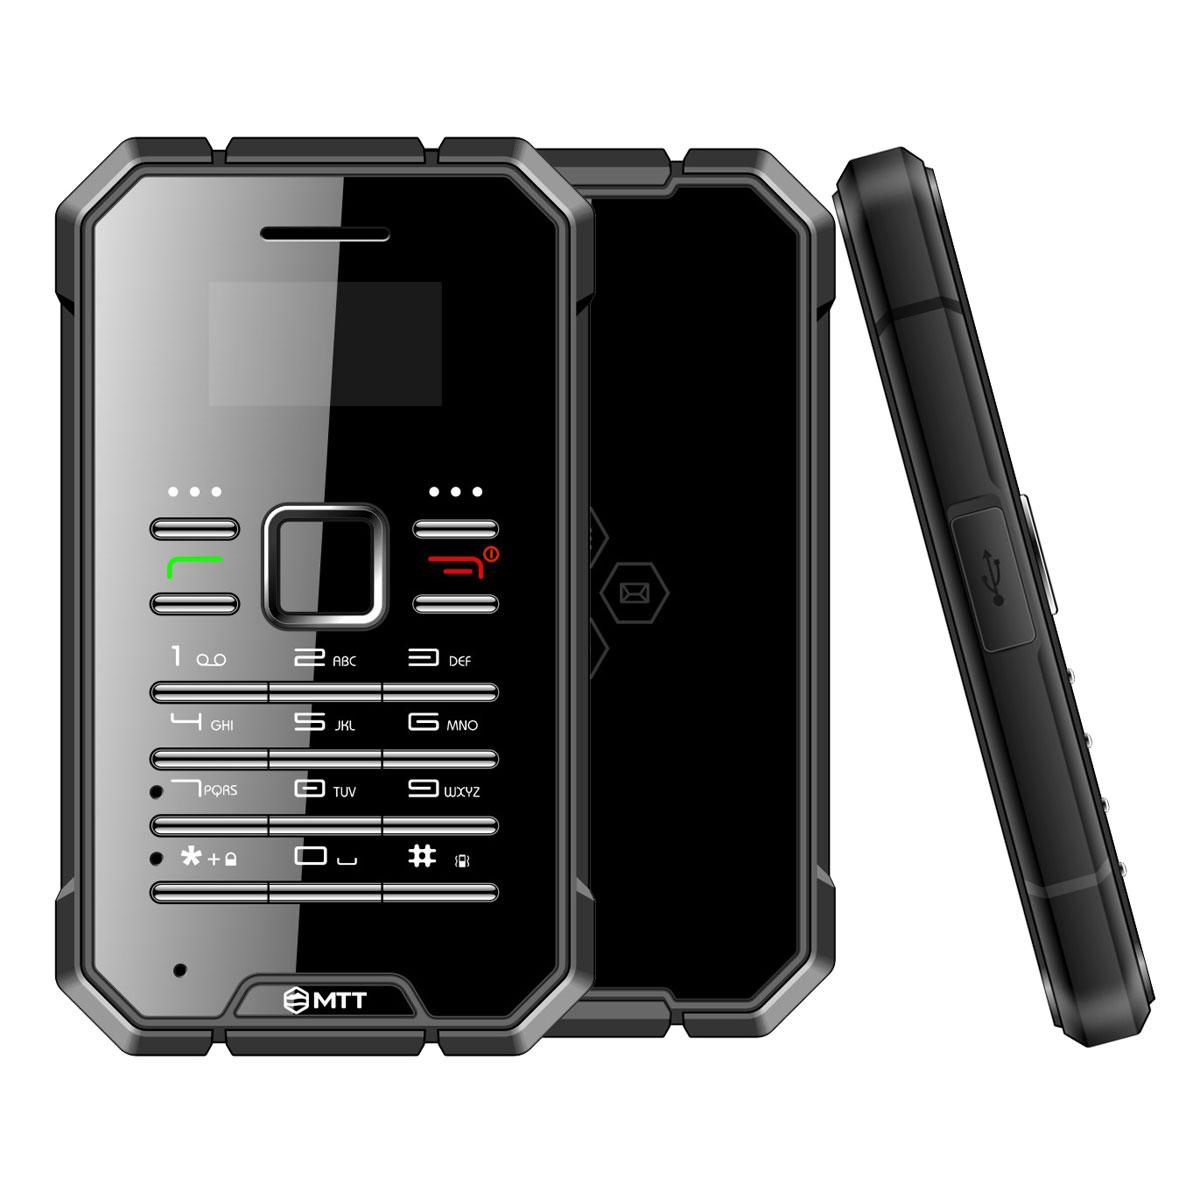 telephonie gps portable mobile smartphone c  fc